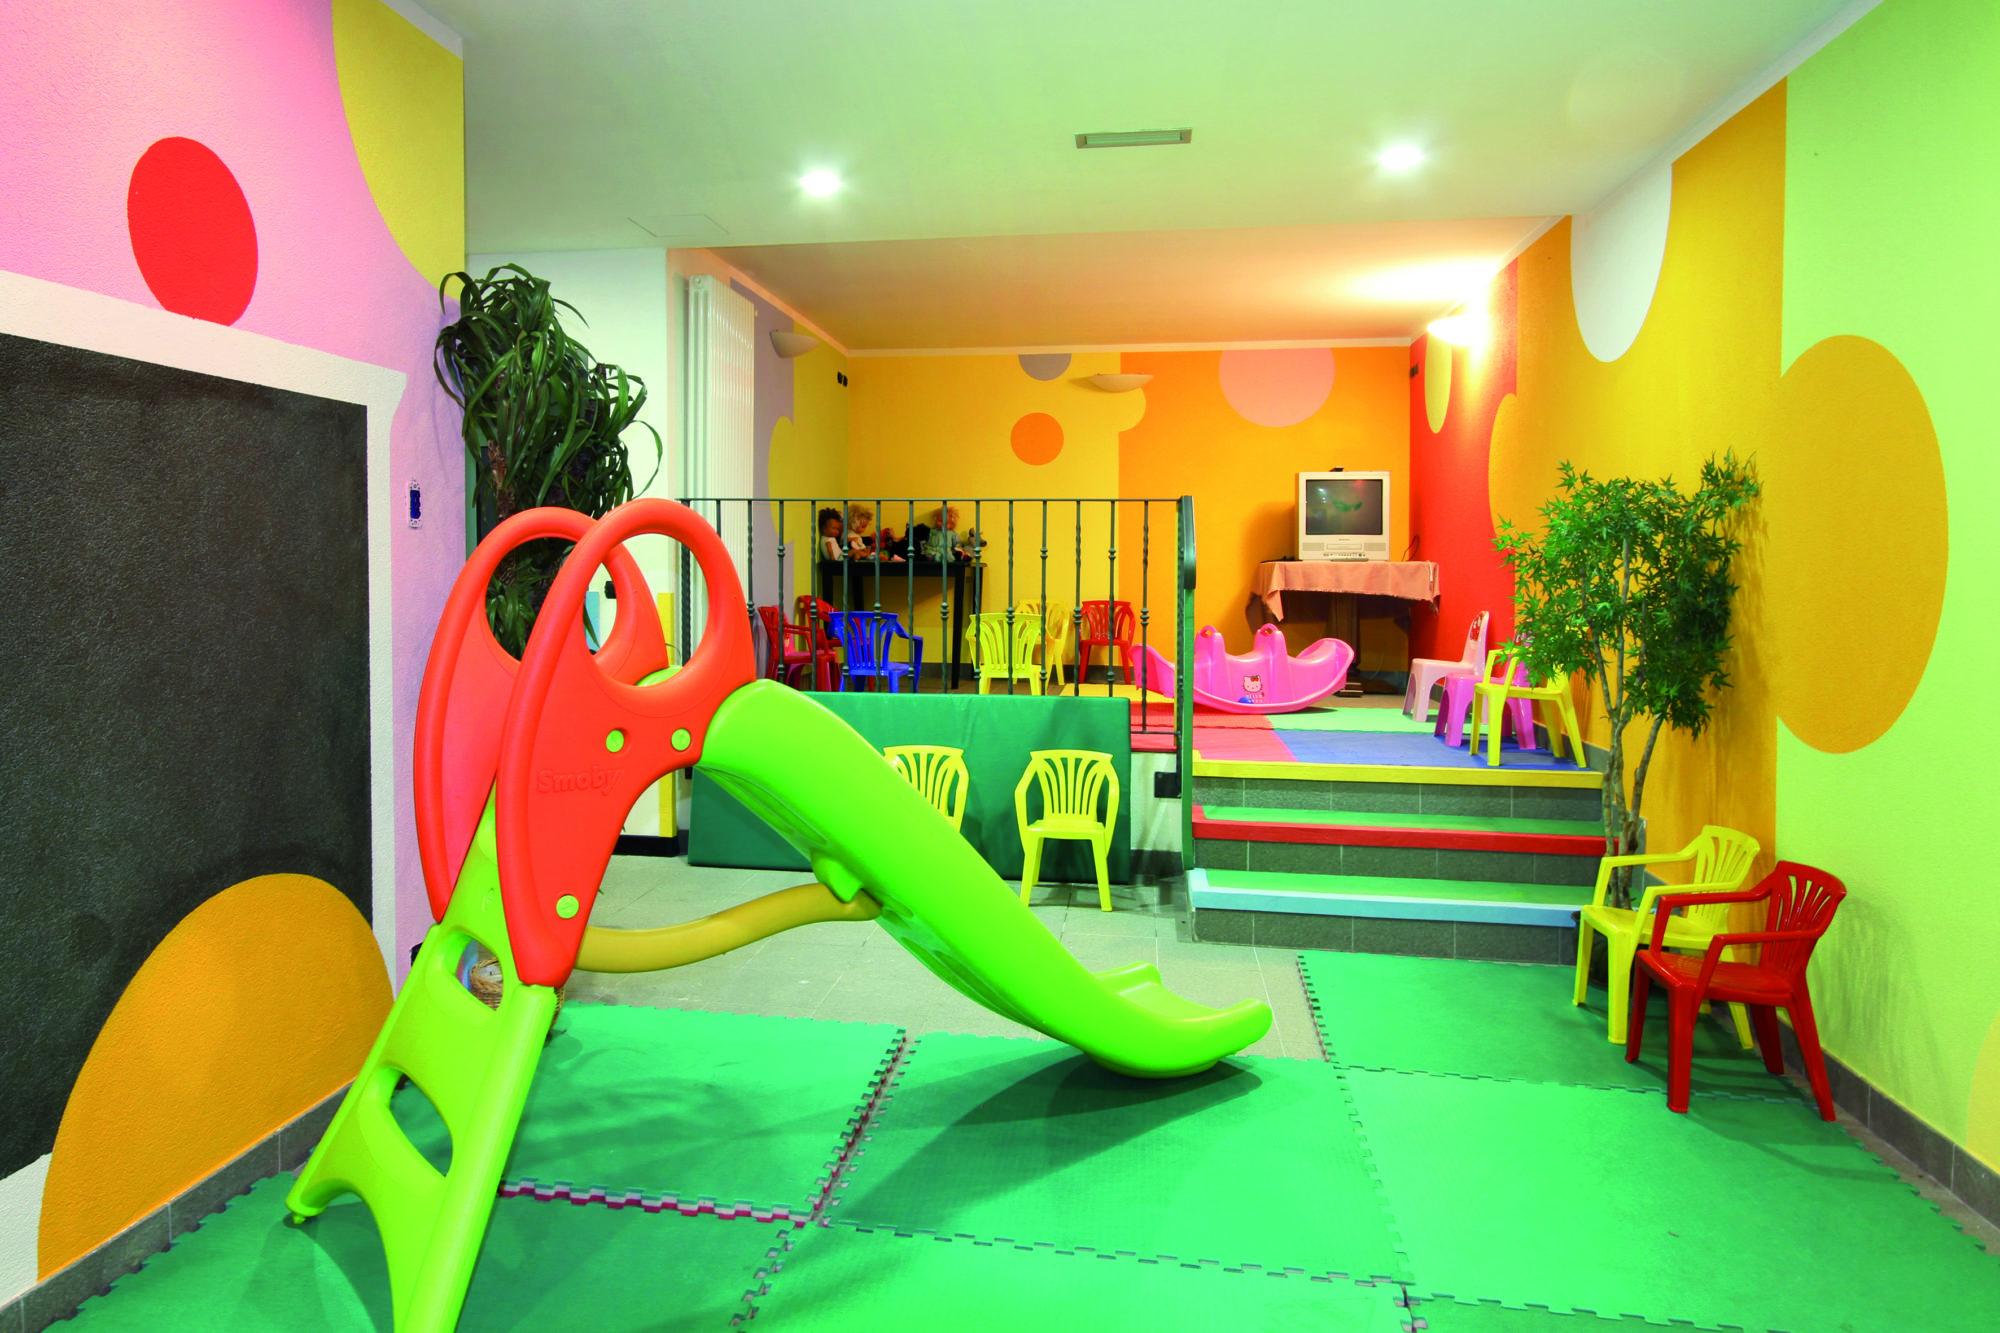 49 Hotel Rubino - Kids club